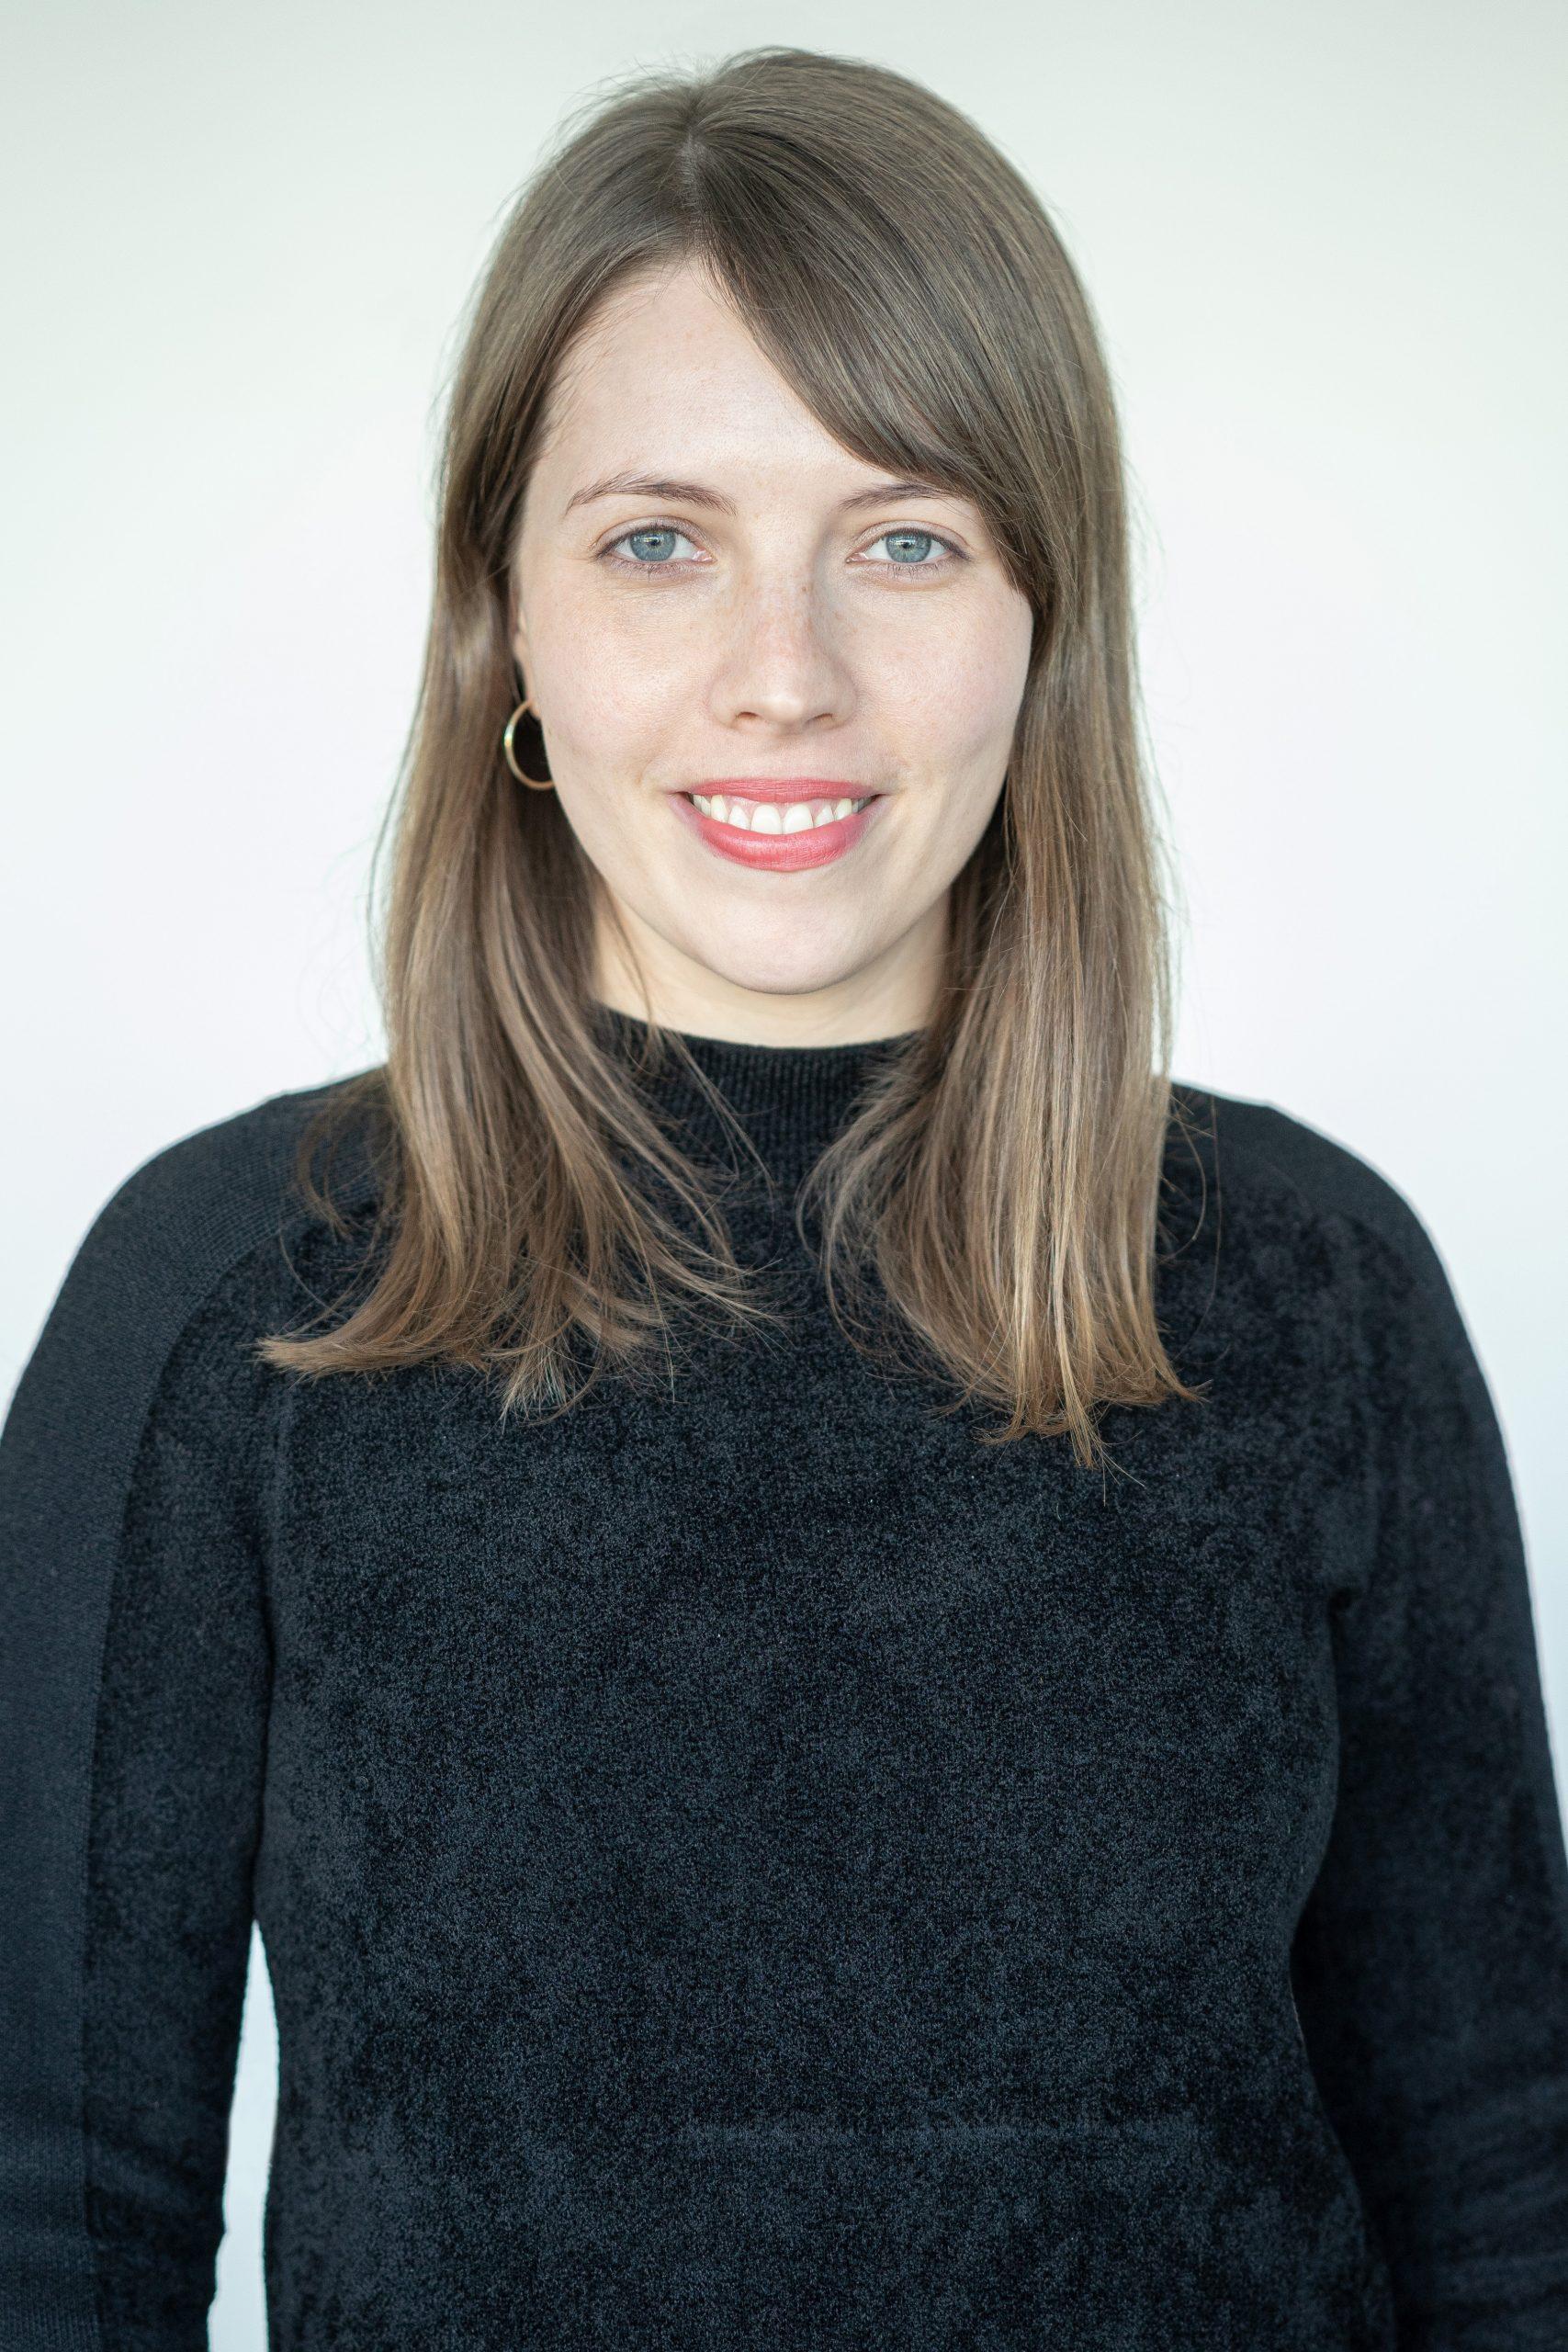 Dr. Anna-Carlotta Zarski